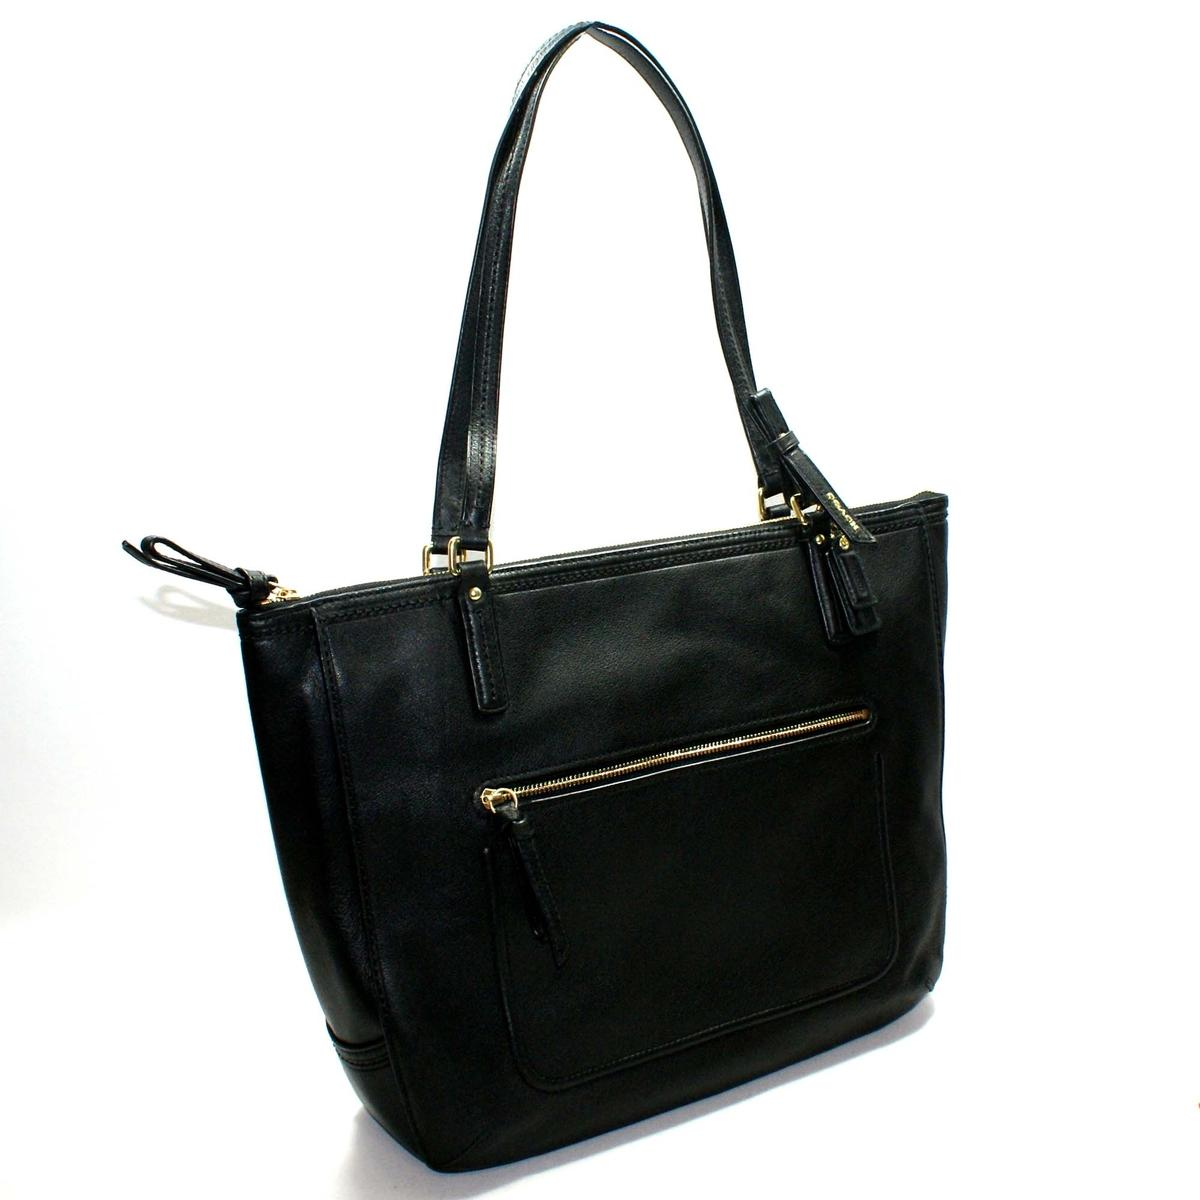 Coach Poppy Black Leather Small Tote #25066 : Coach 25066